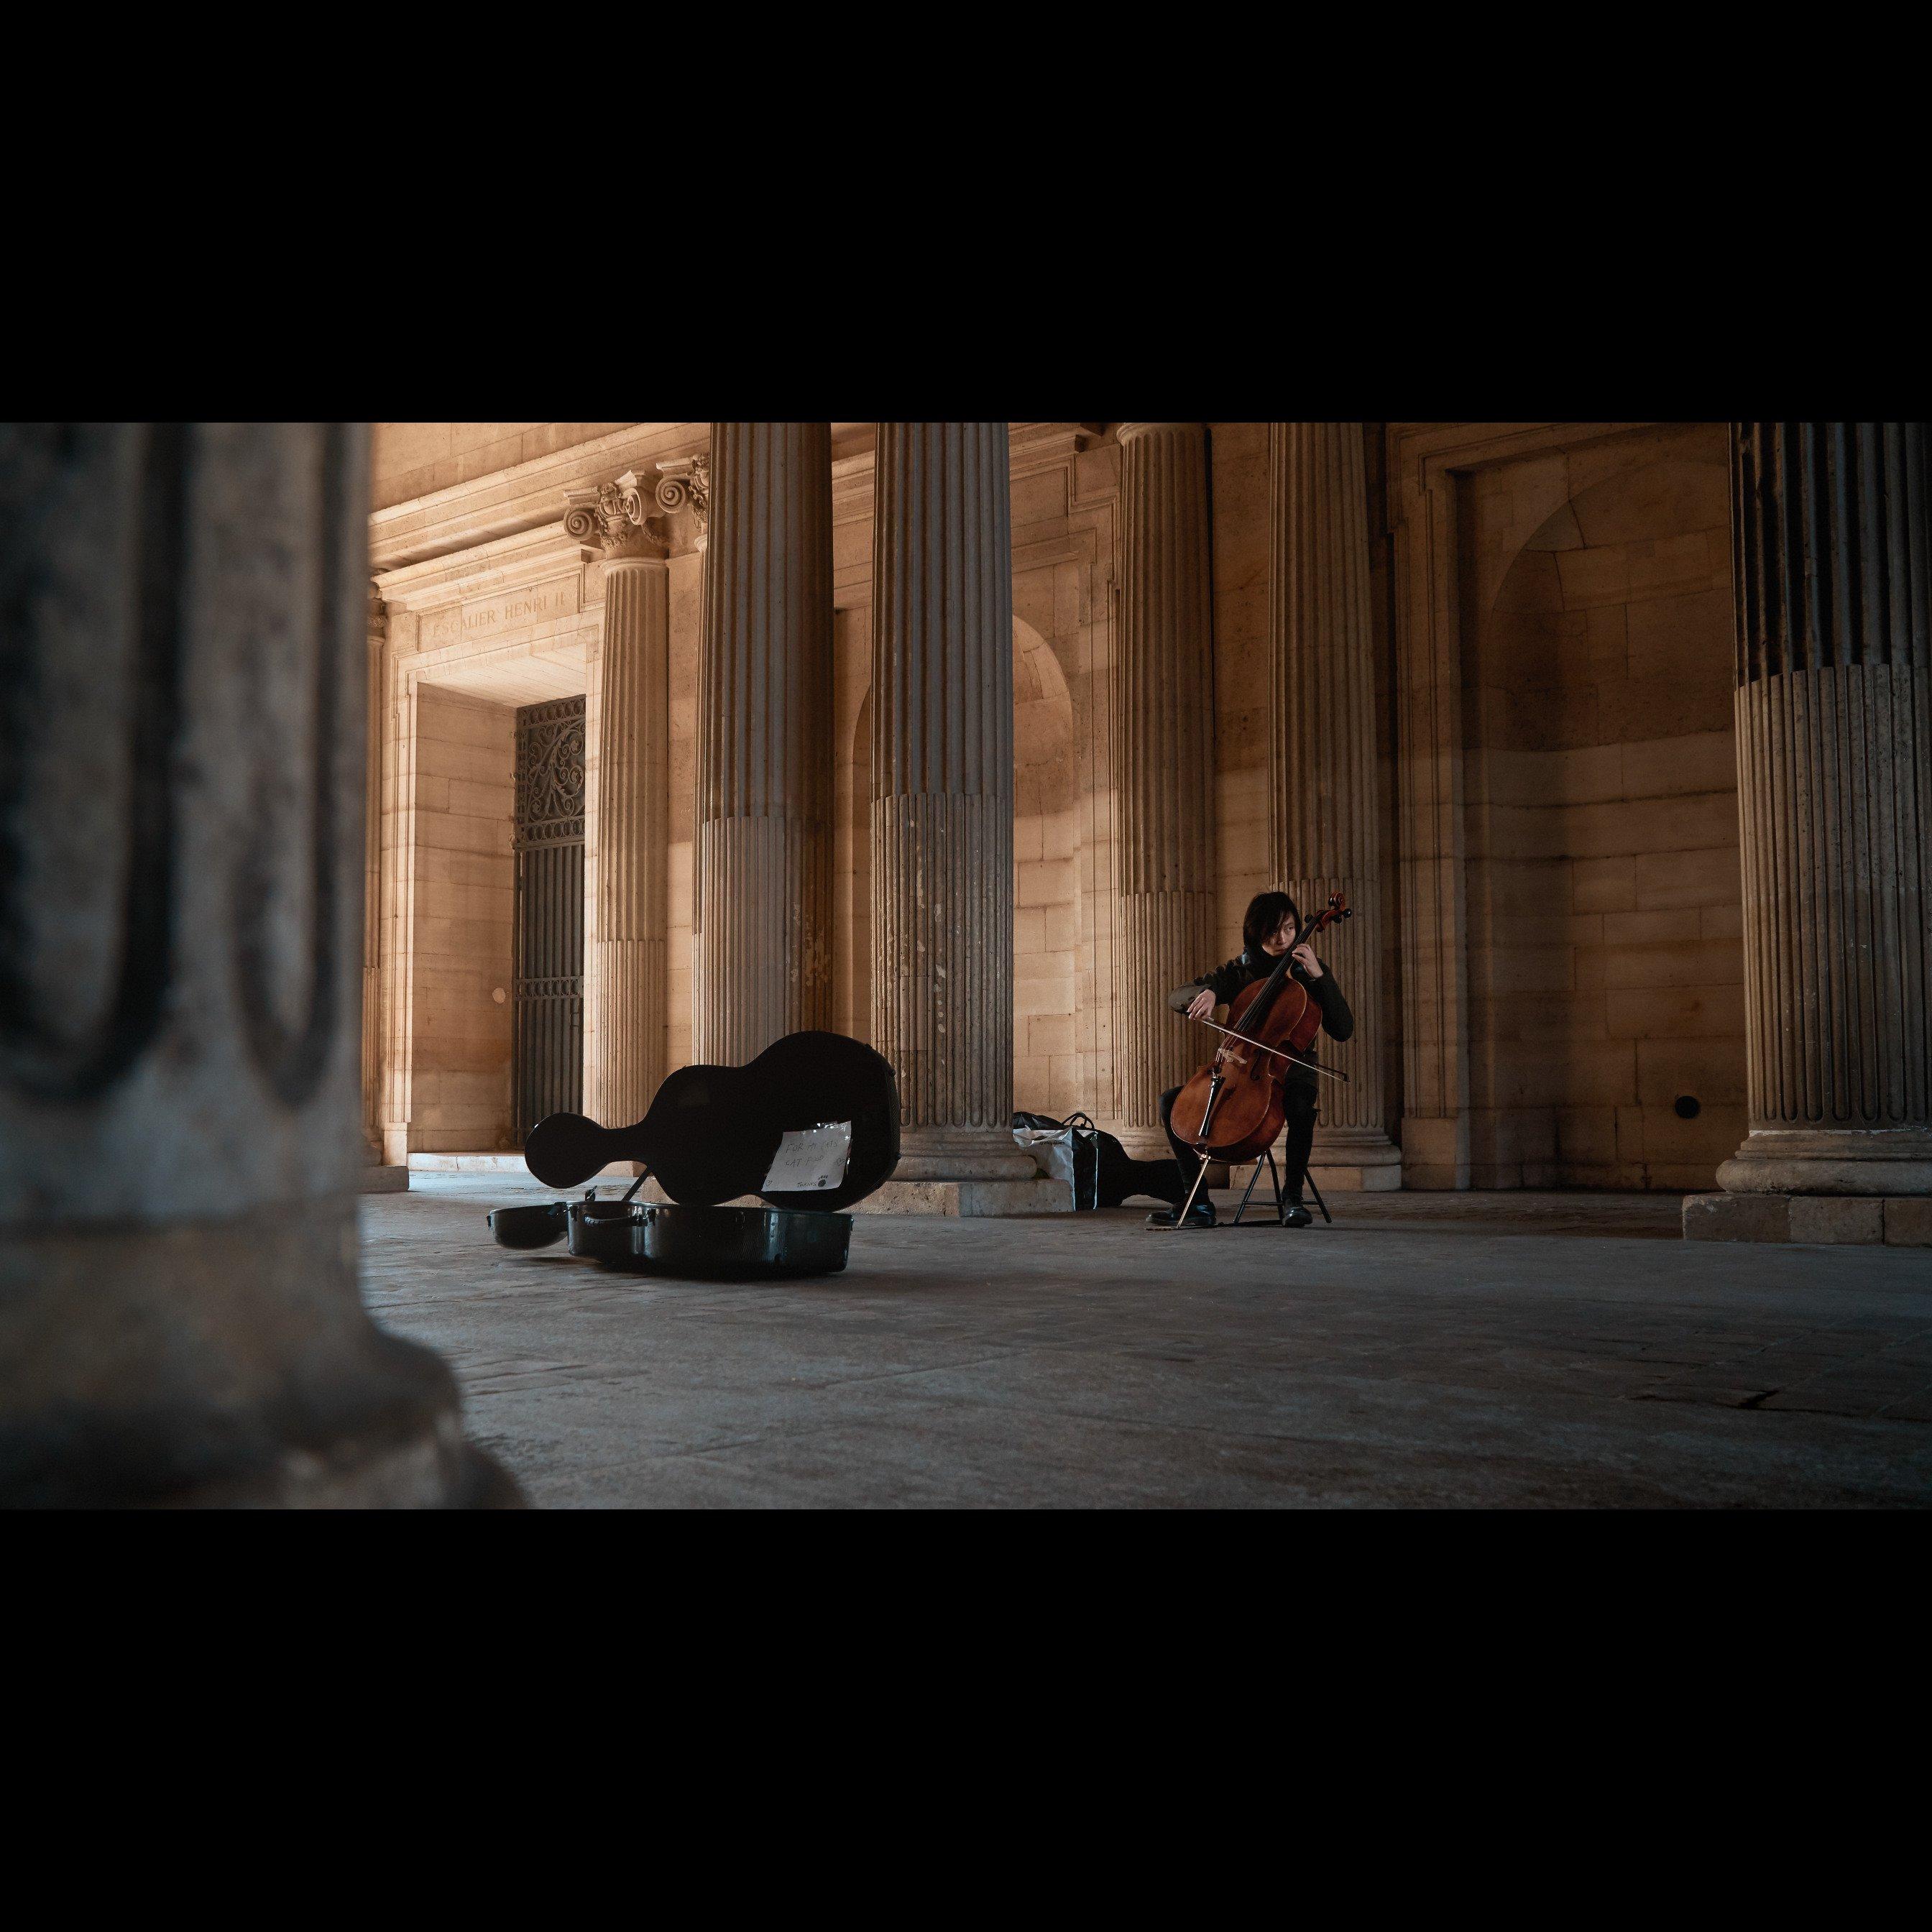 cello, cellist, Louvre, Paris, sunrise, columns, cinematic, colorgrading, colorgraded, morning, Кыштымов Максим